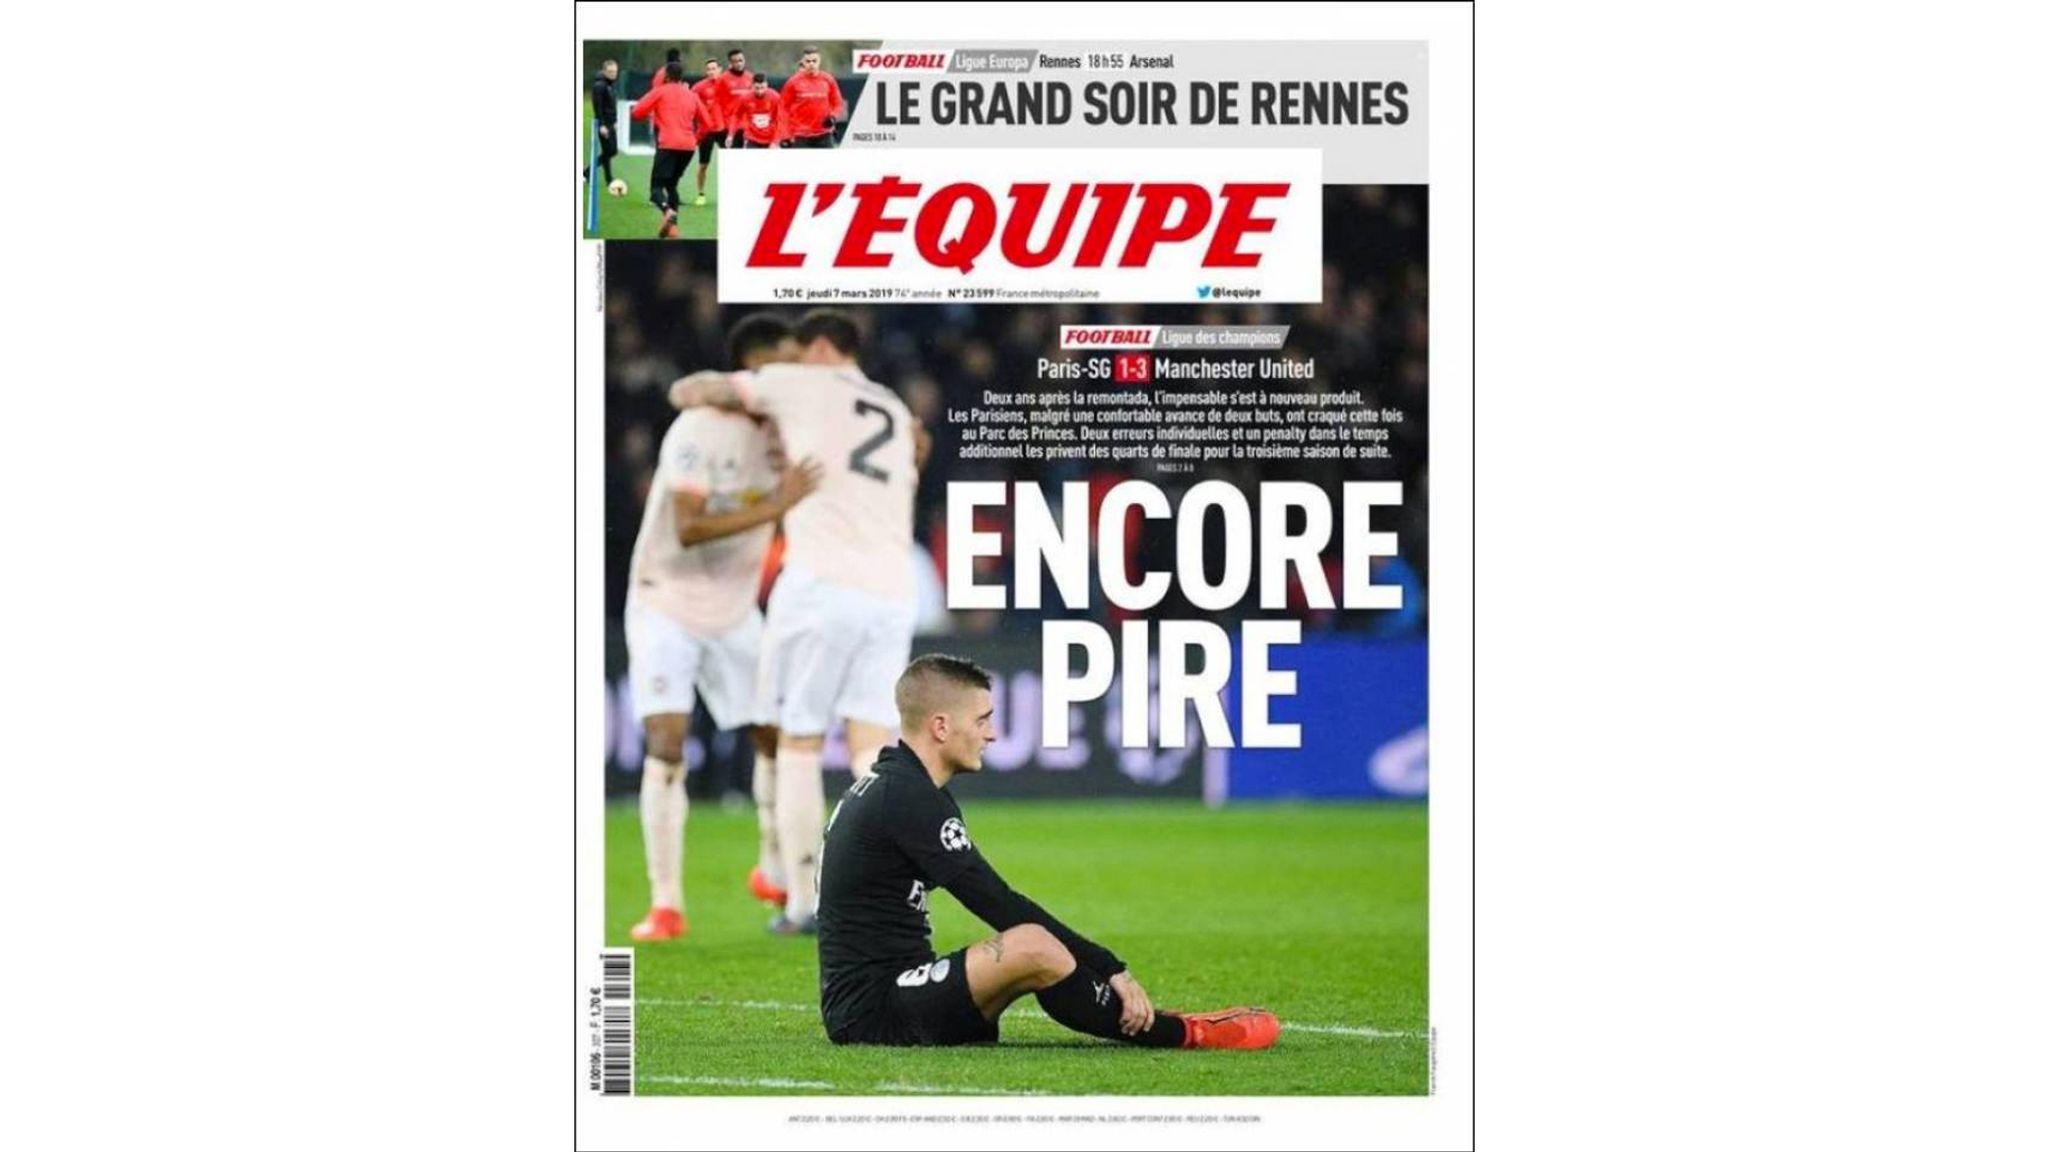 8eda45d71a PSG's 'unforgivable' Champions League exit: French press react   Football  News   Sky Sports